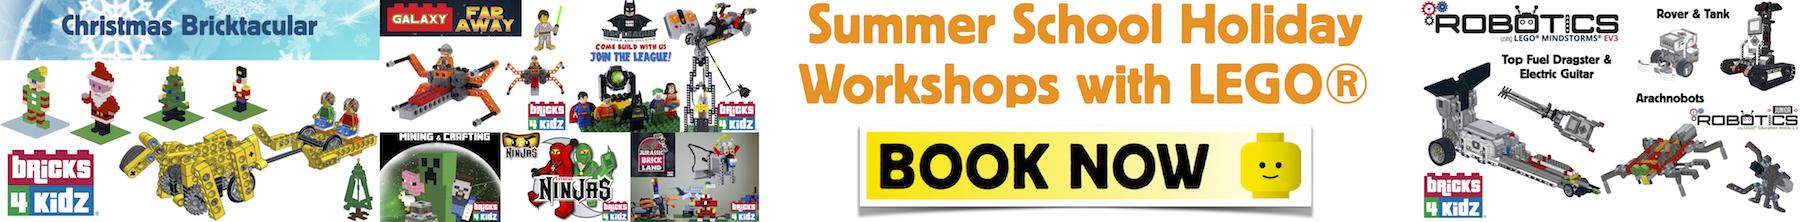 Summer School Holiday Workshops